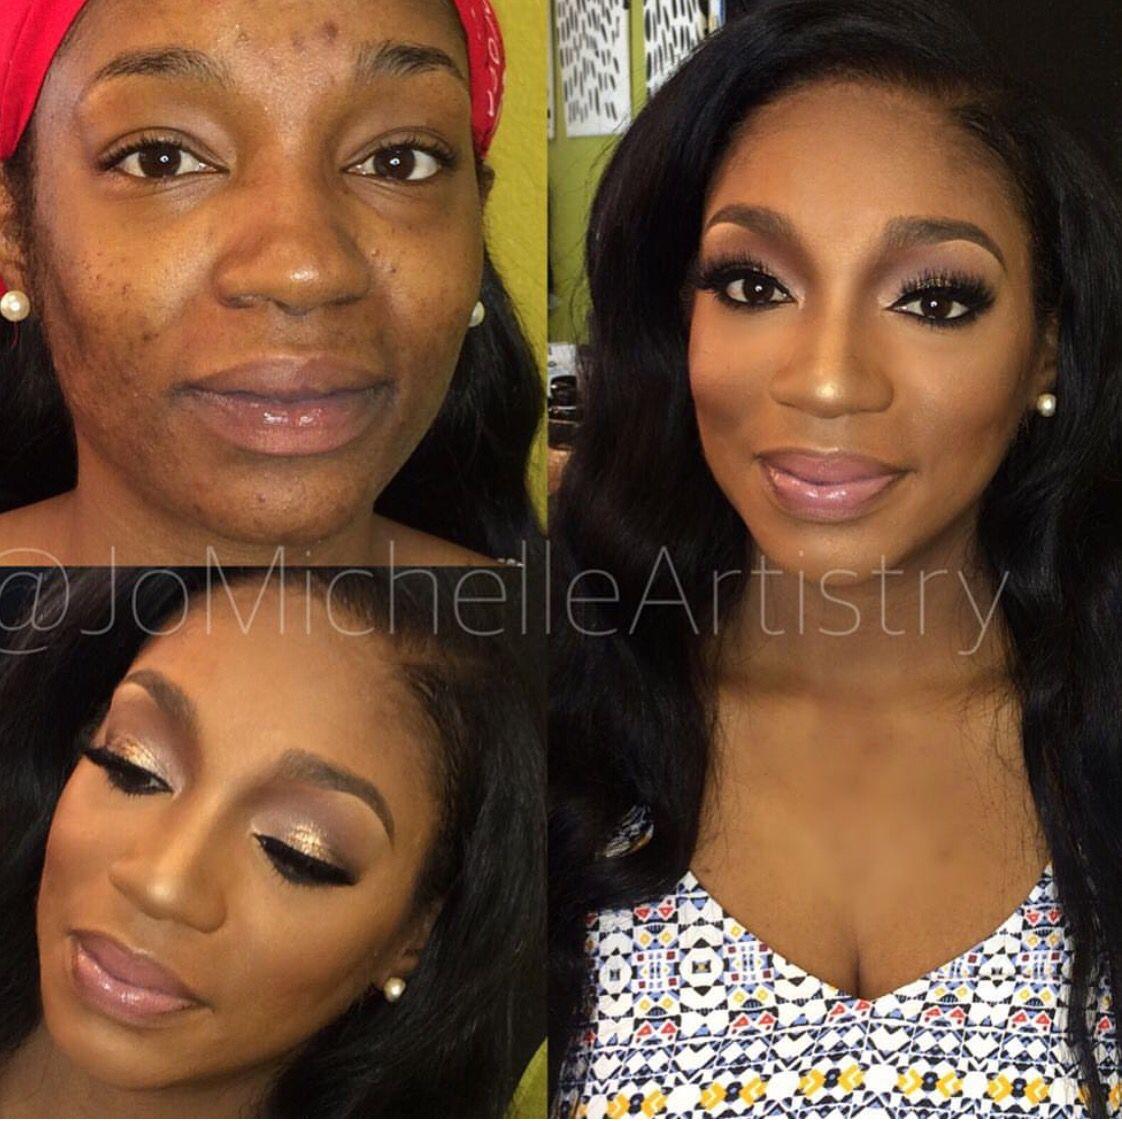 Makeup for black women Makeup for beginners, Contour